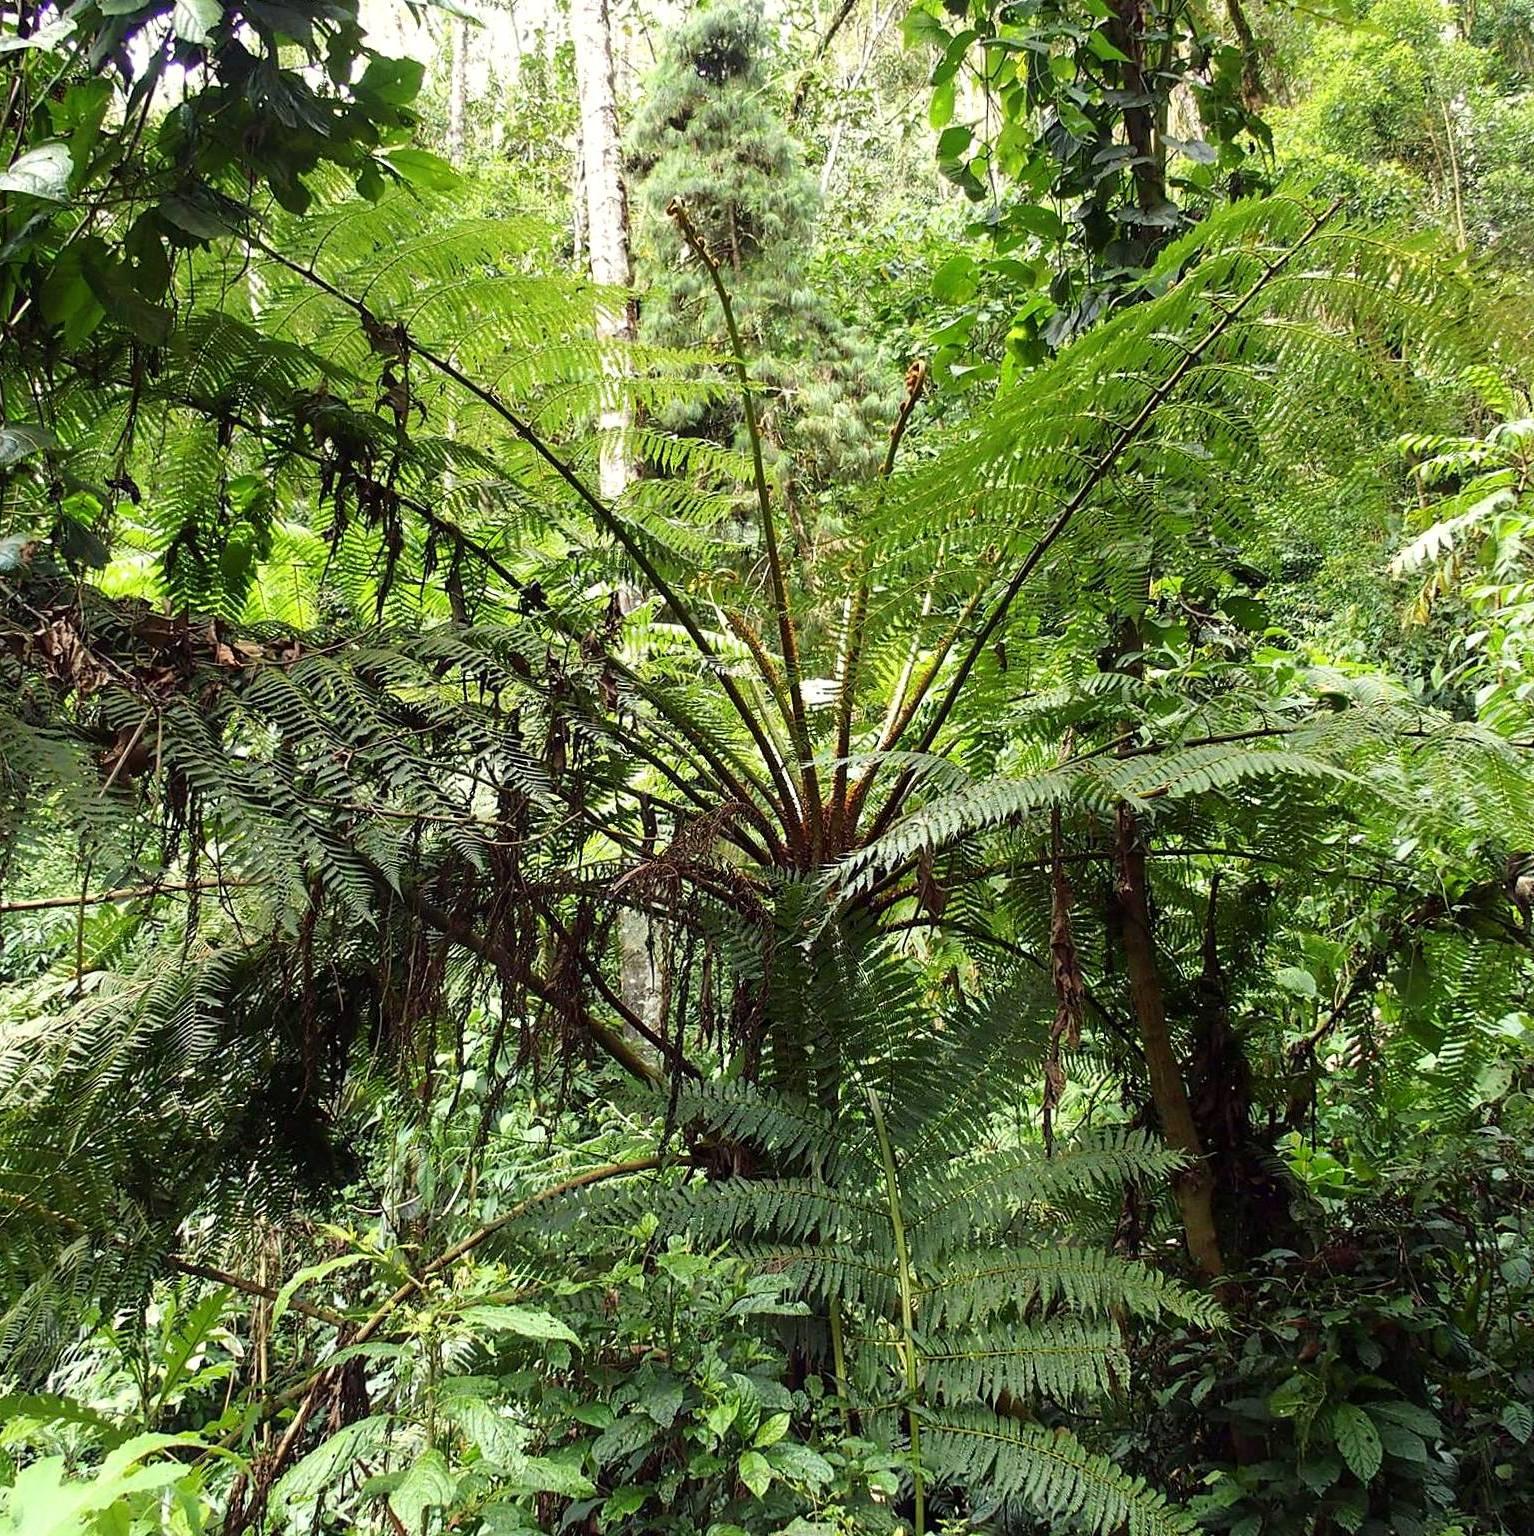 Végétation luxuriante vallée de Cocora Salento